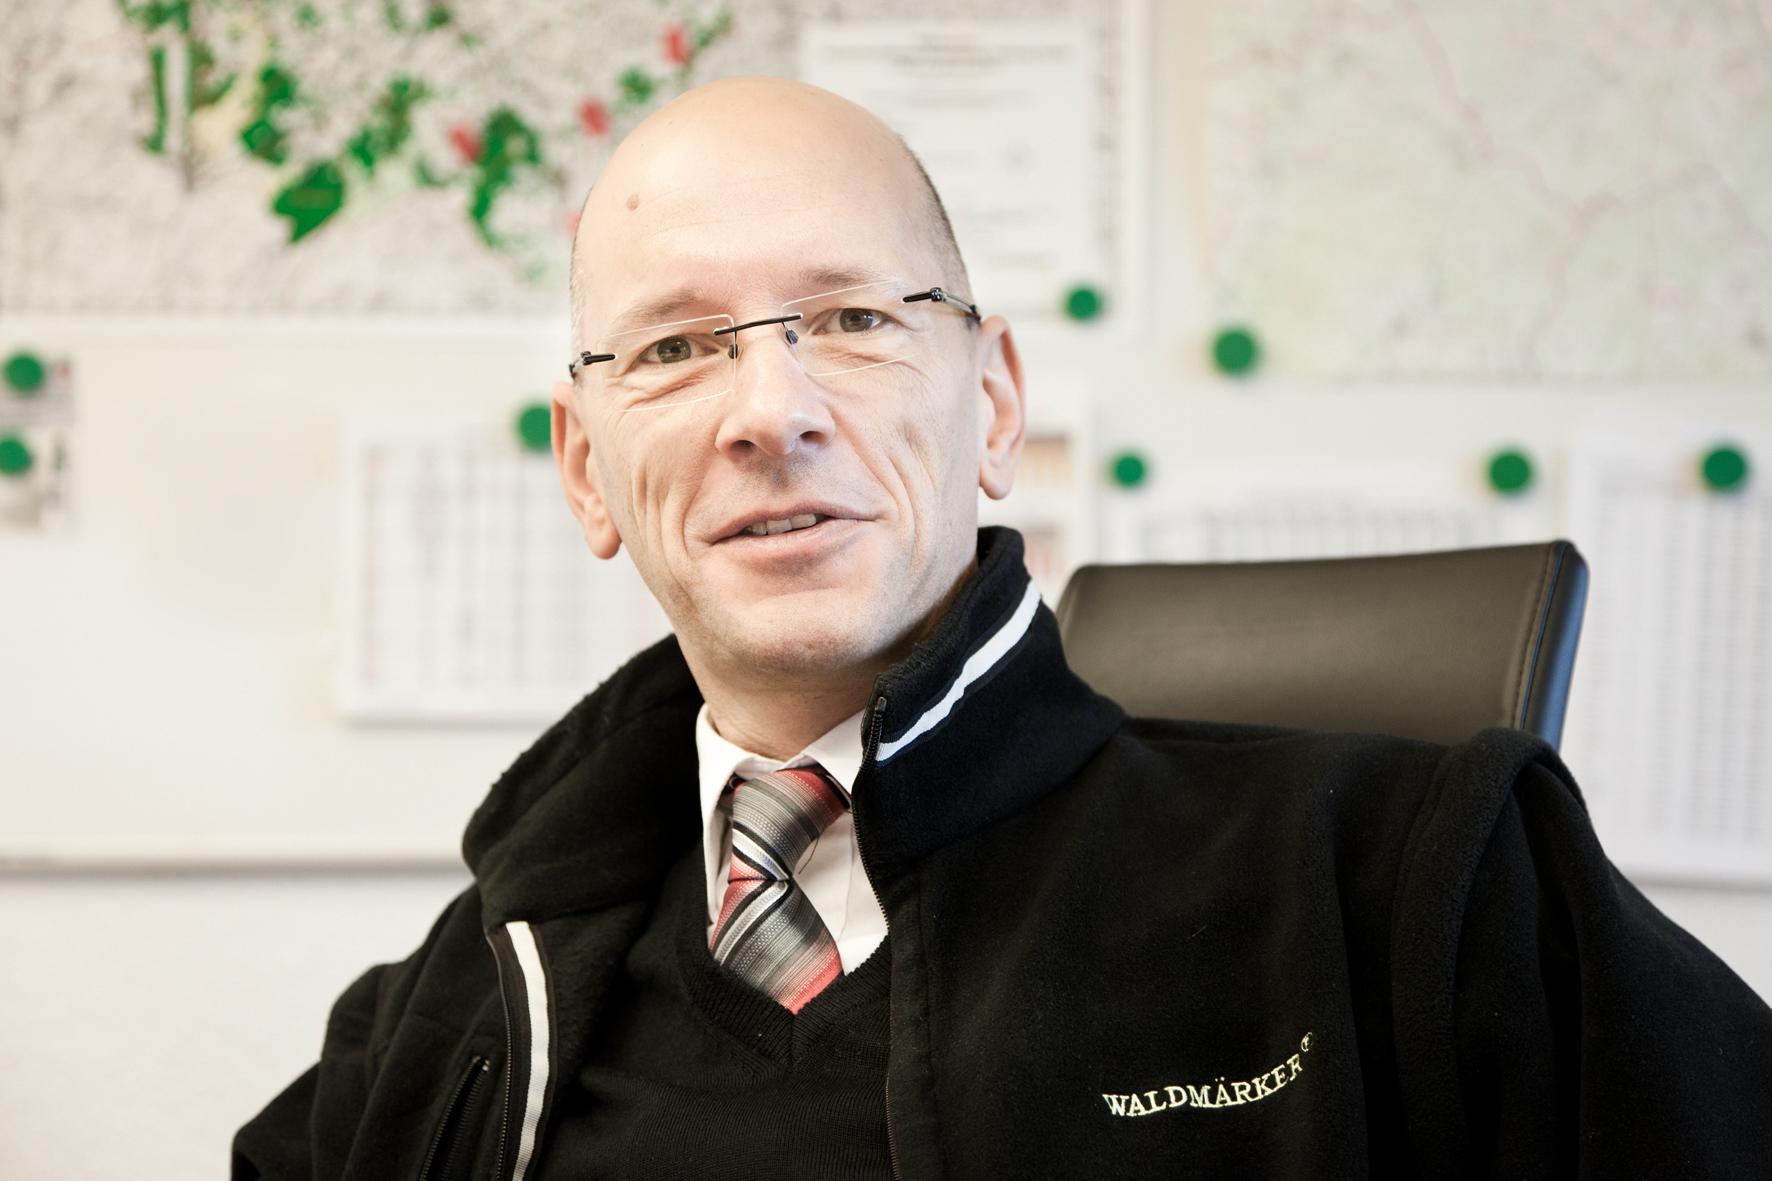 Markus Hecker